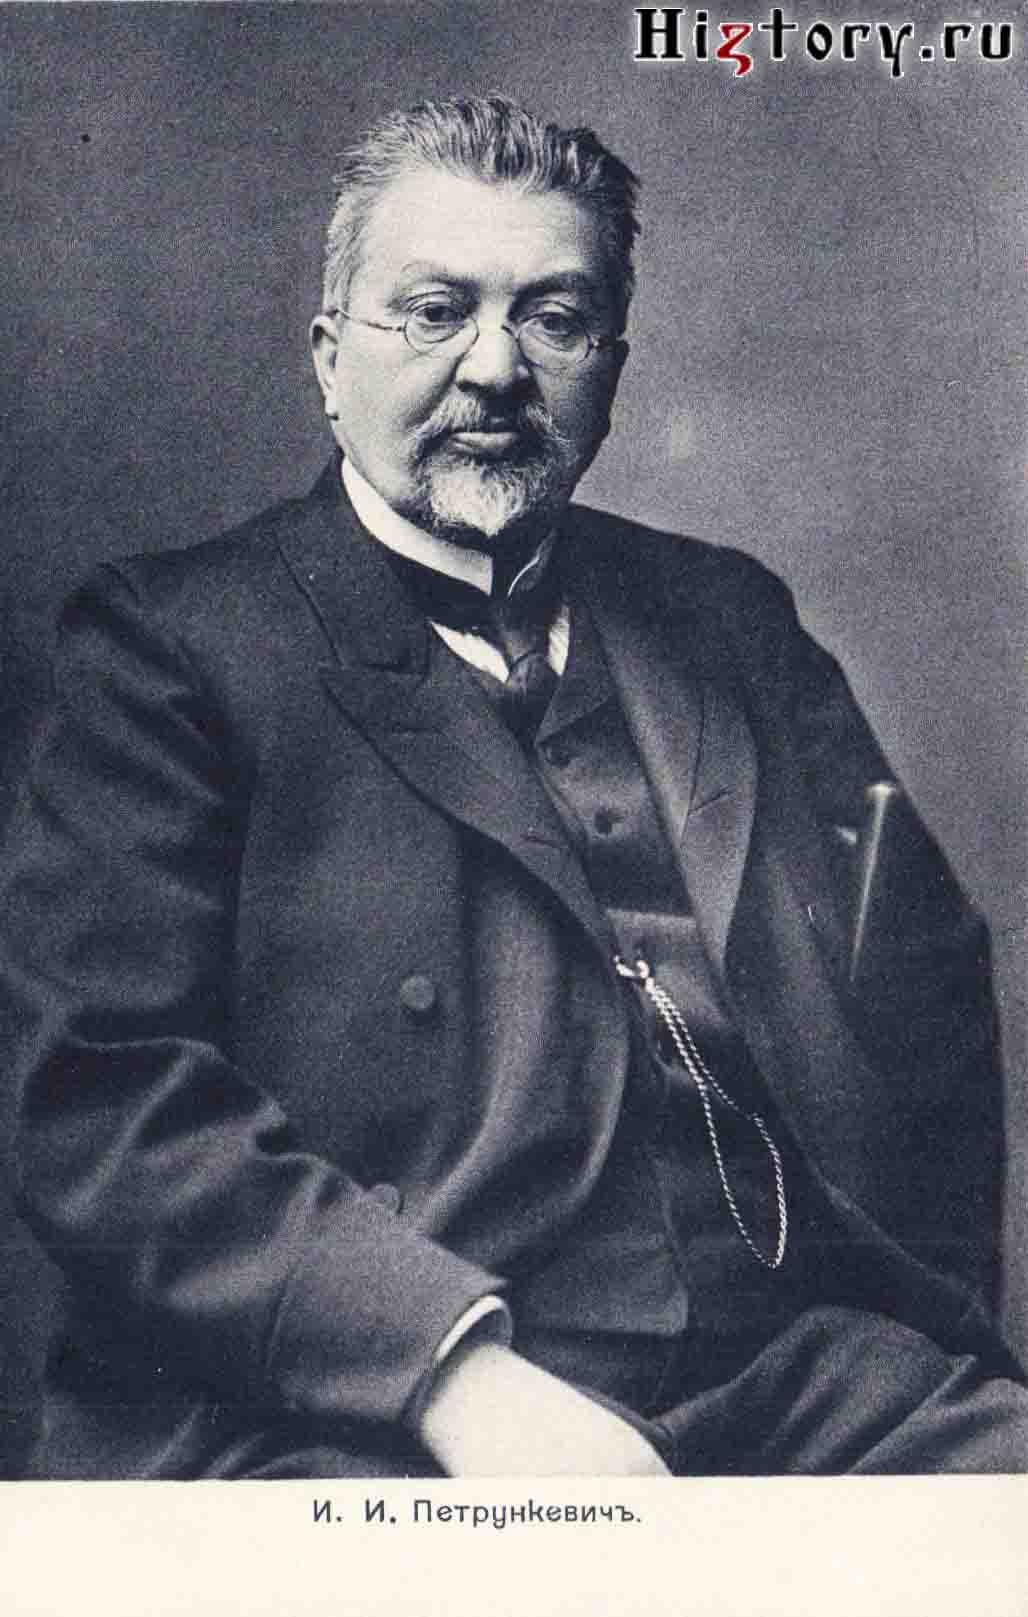 Петрункевич